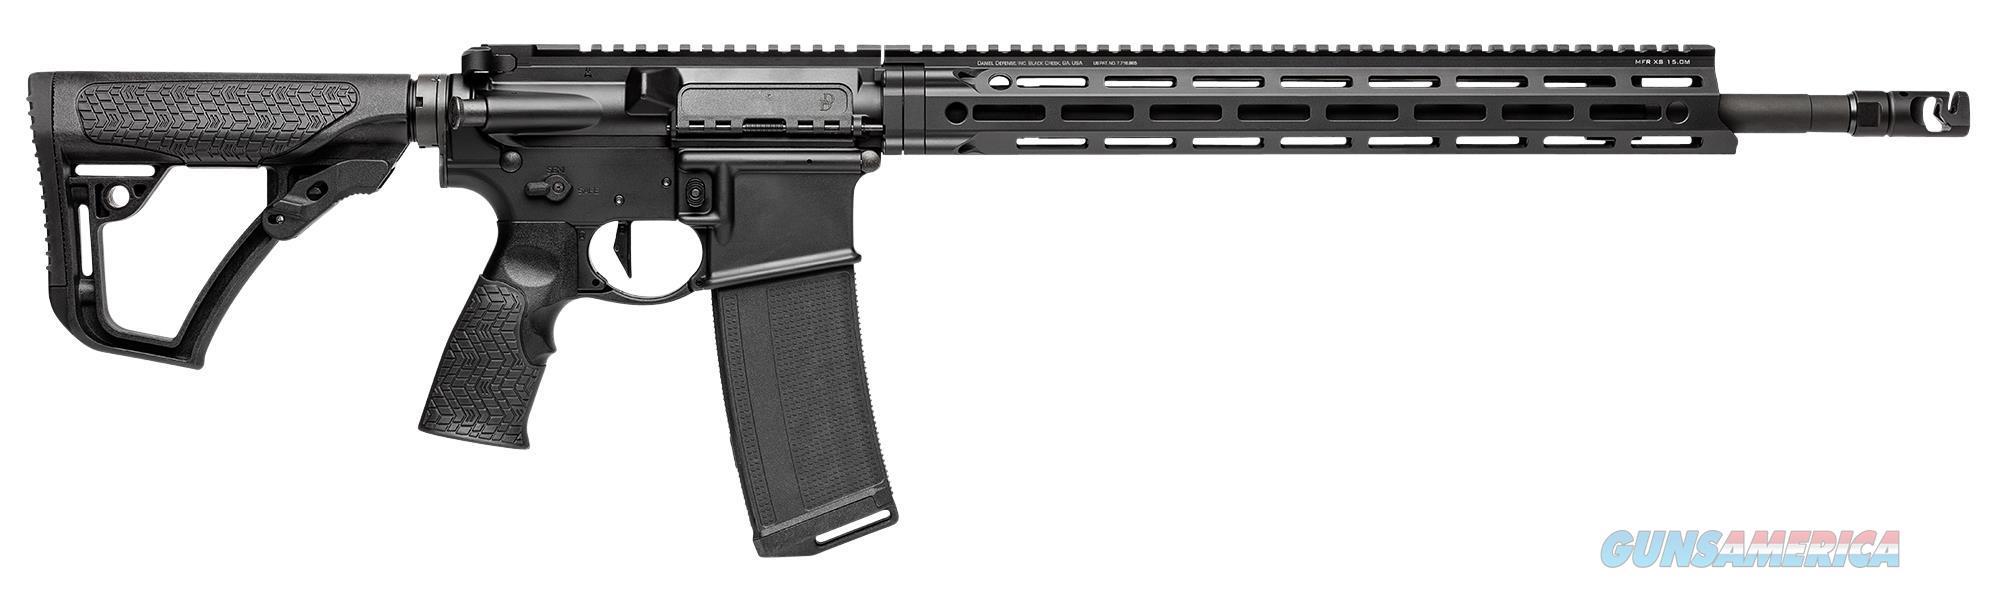 "Daniel Defense 16541055 Ddm4 V7 Pro *Ca Compliant* Semi-Automatic 223 Remington/5.56 Nato 18"" 10+1 6-Position Black Stock Black 16541055  Guns > Rifles > D Misc Rifles"